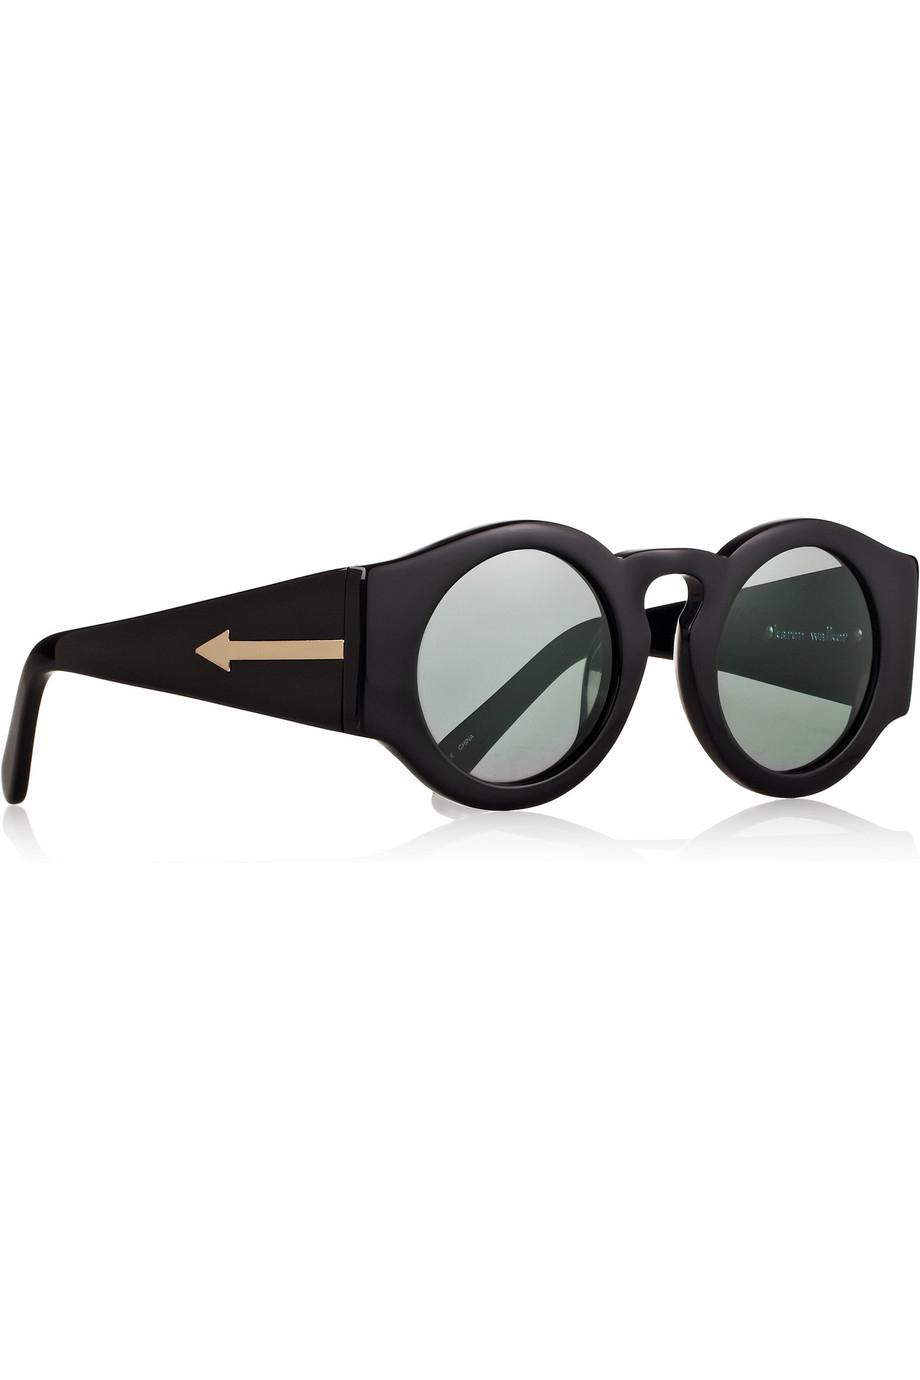 Karen Walker Blue Moon Round-Frame Acetate Sunglasses in Black - Lyst